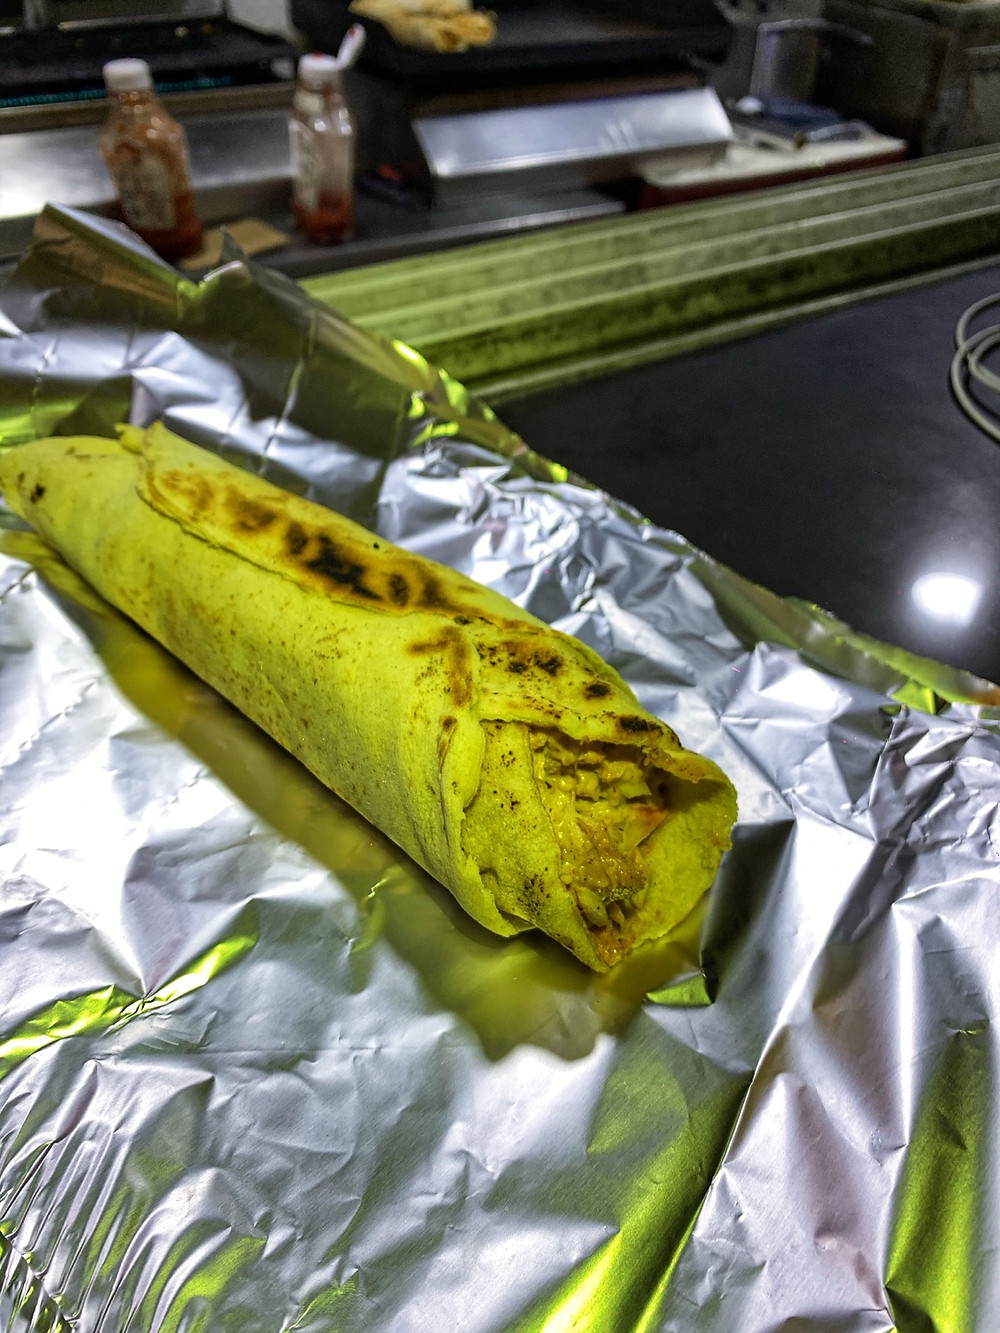 A common Nigerian street food